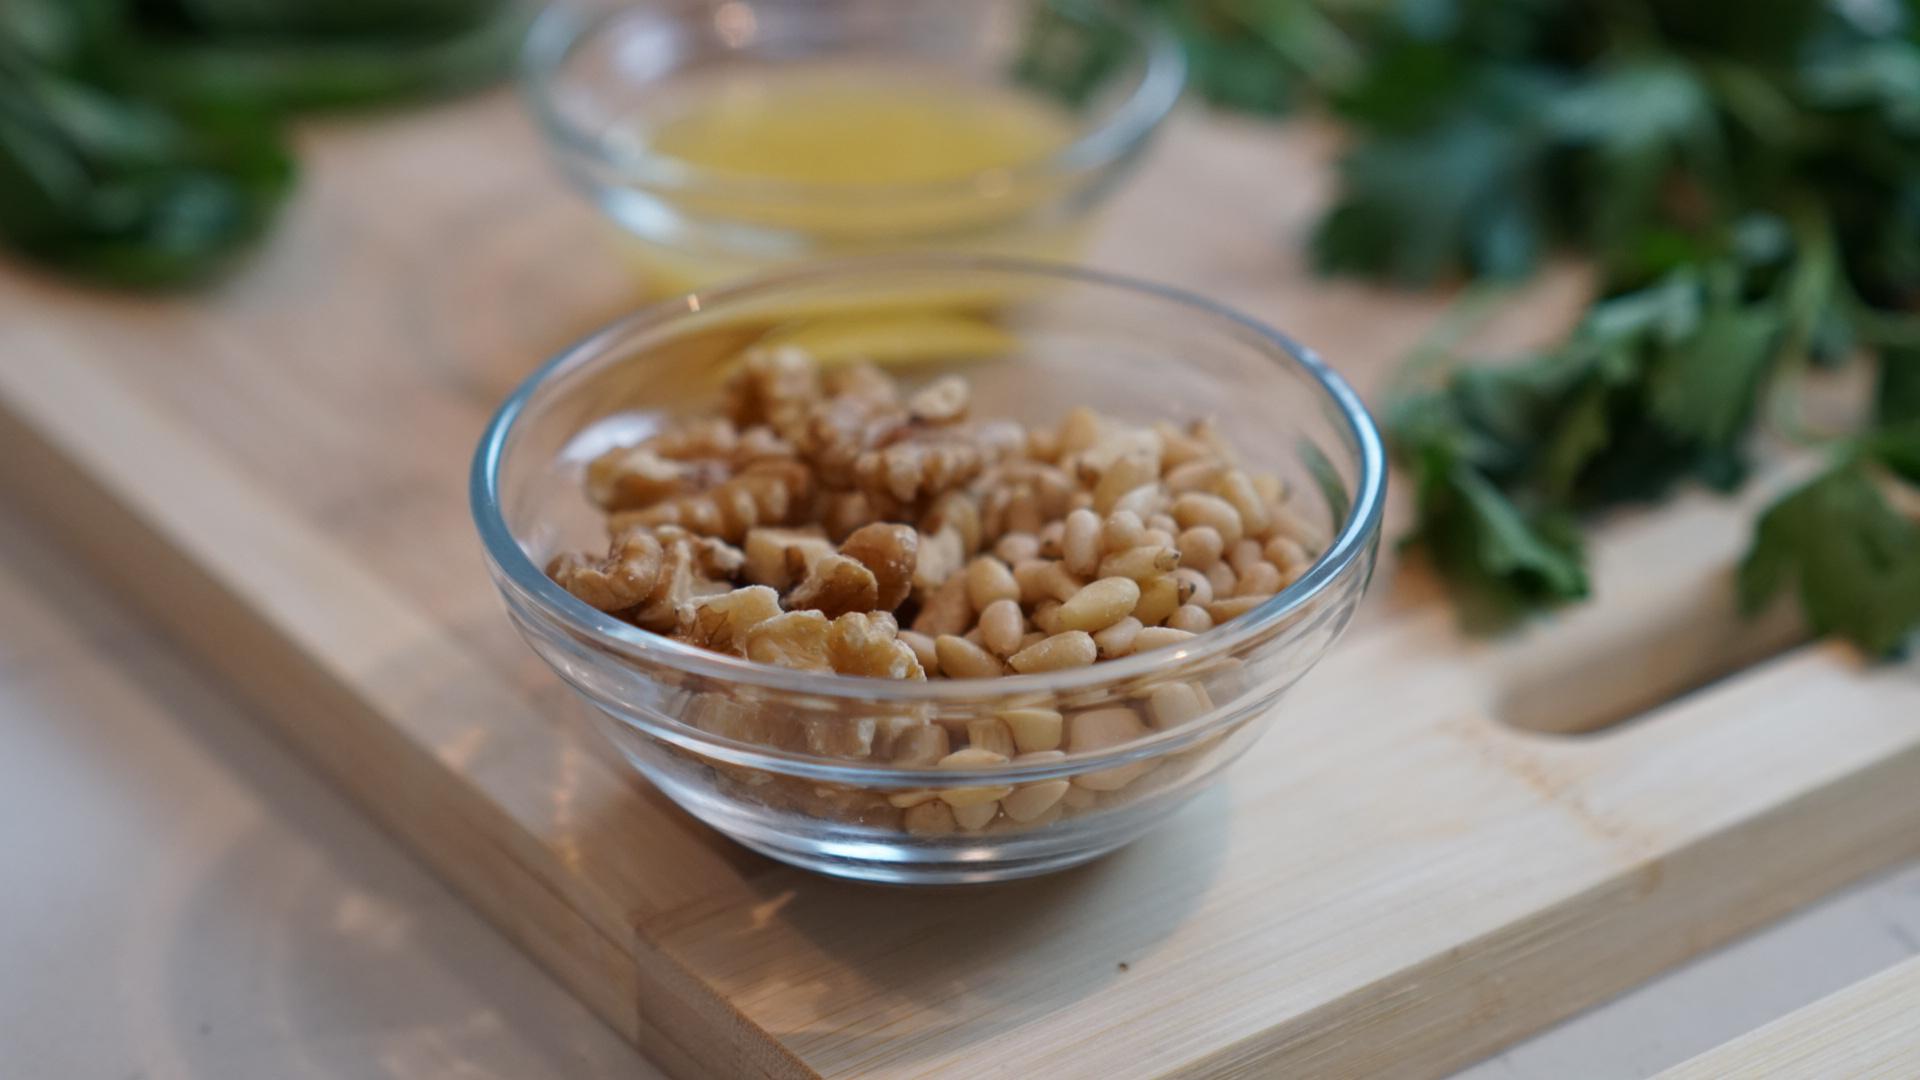 Walnuts and pine nuts